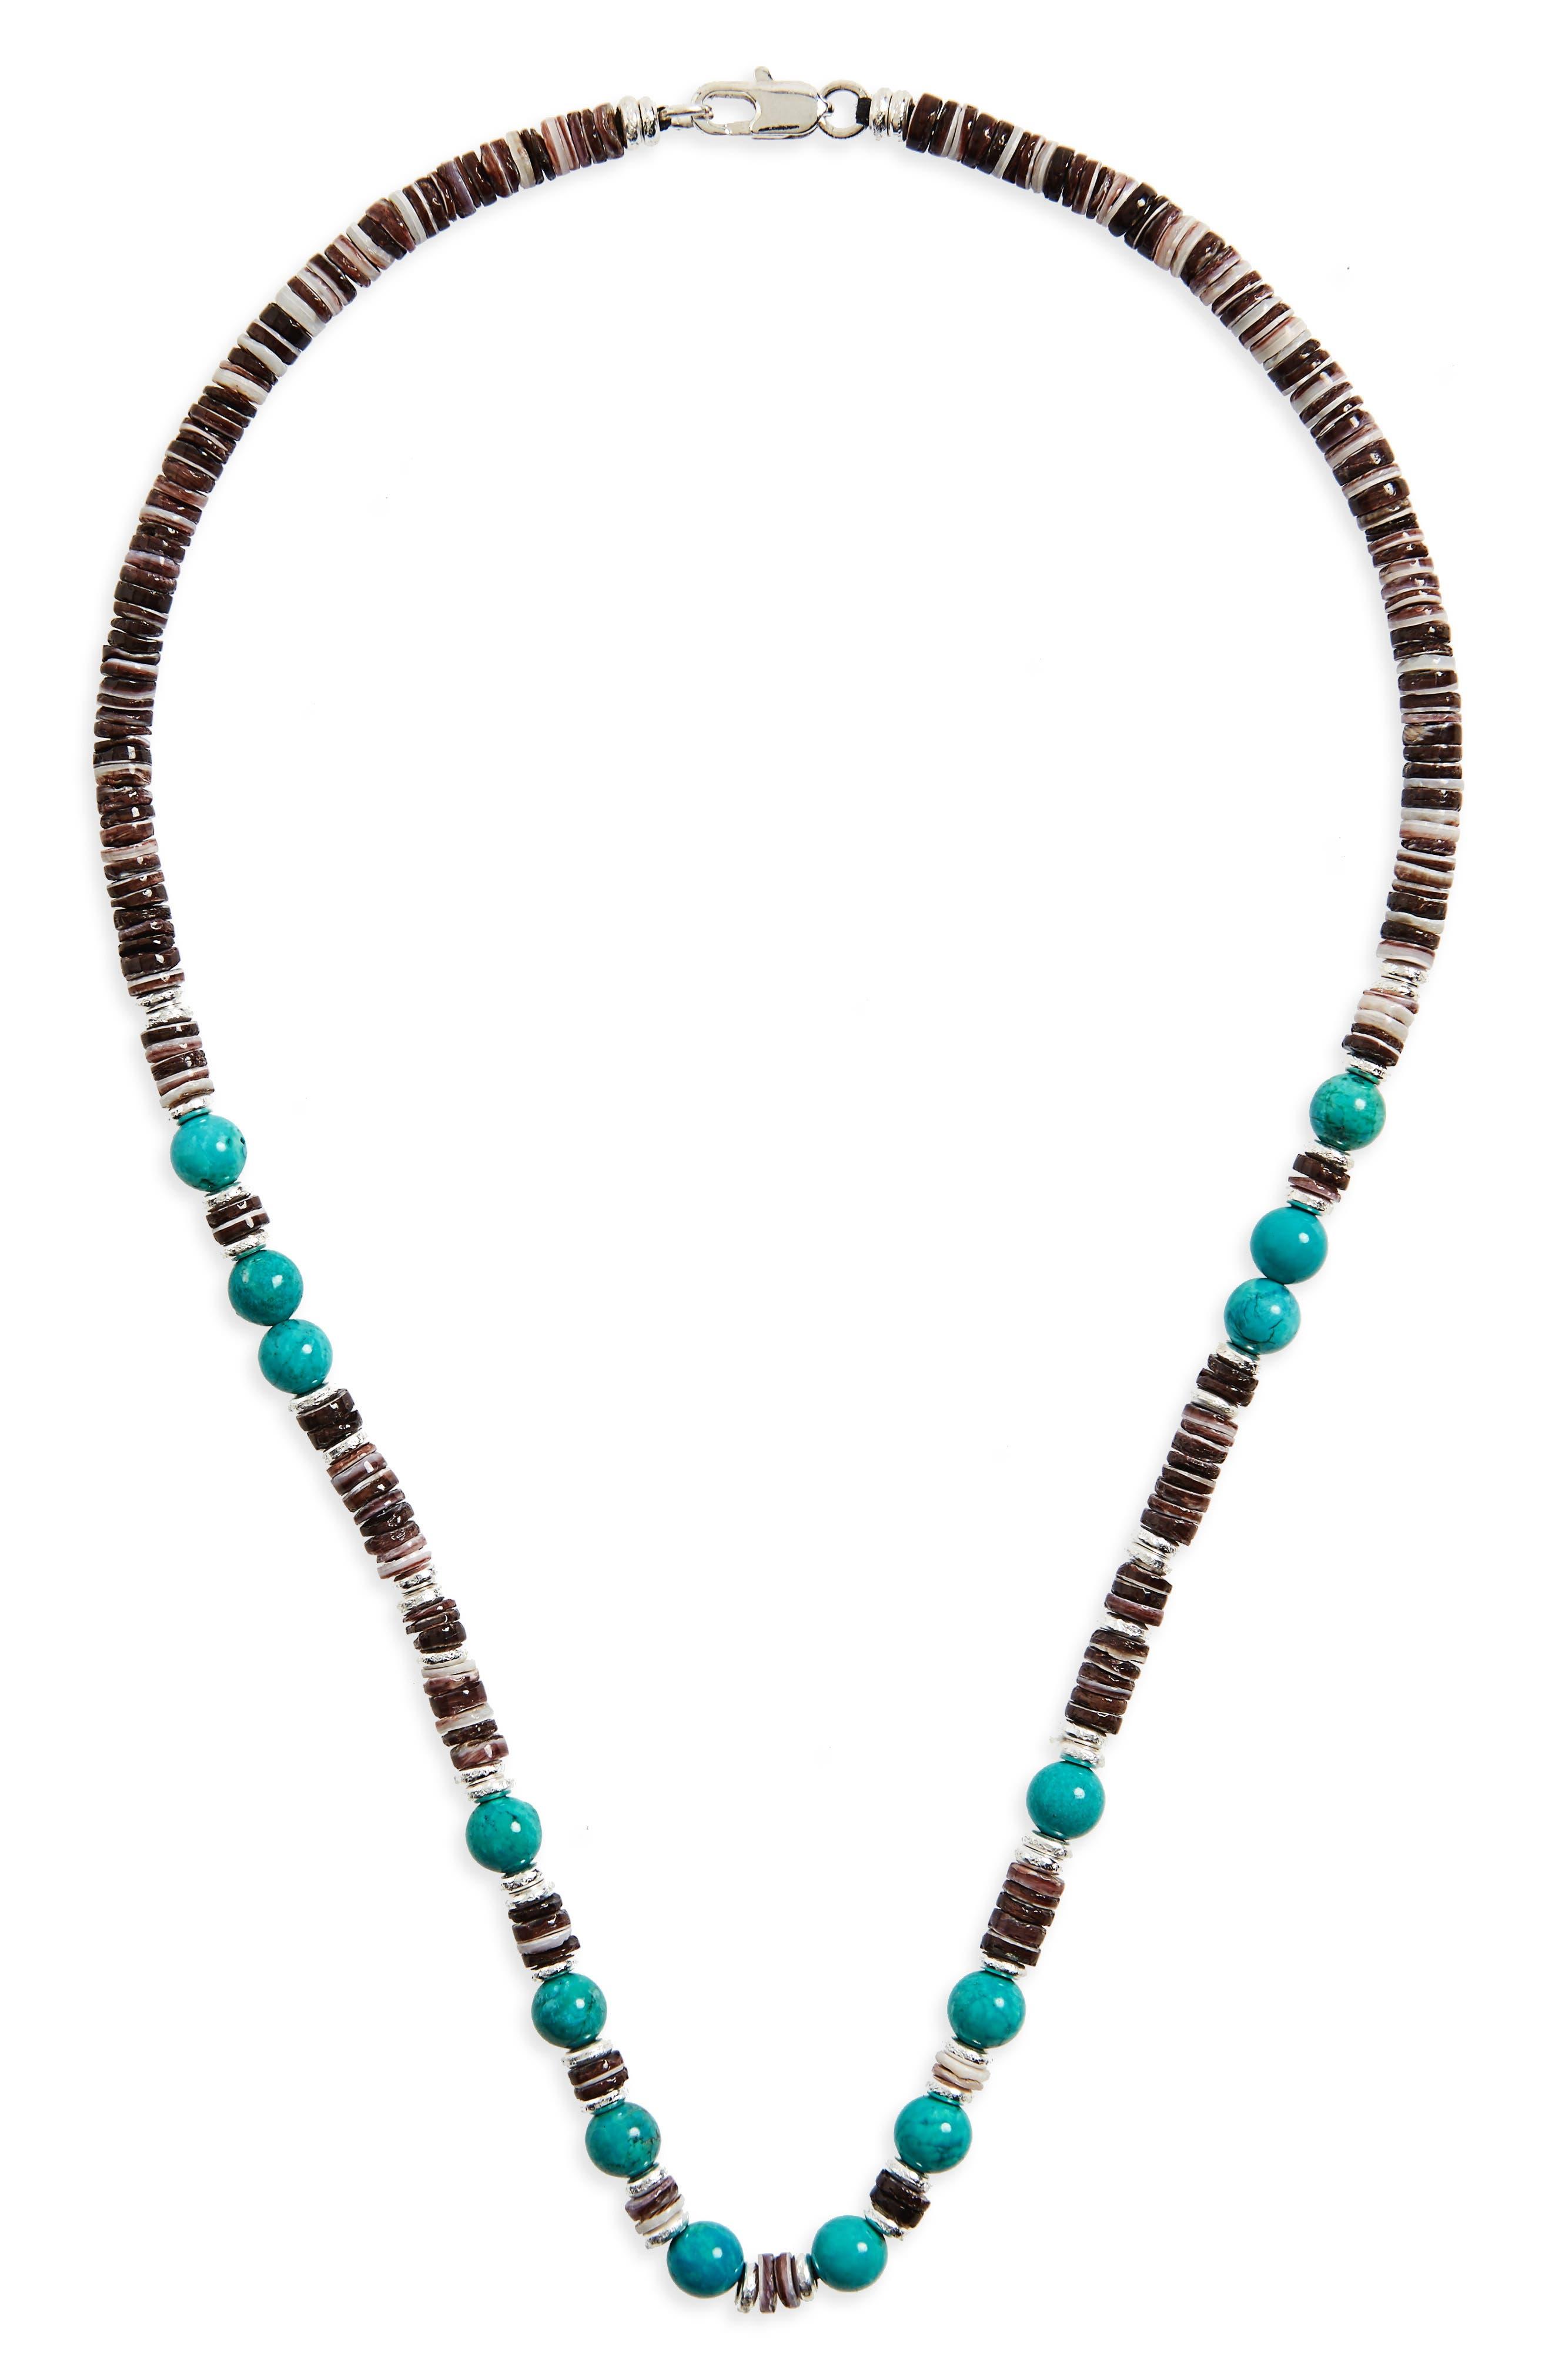 Shell Bead Necklace,                             Main thumbnail 1, color,                             001